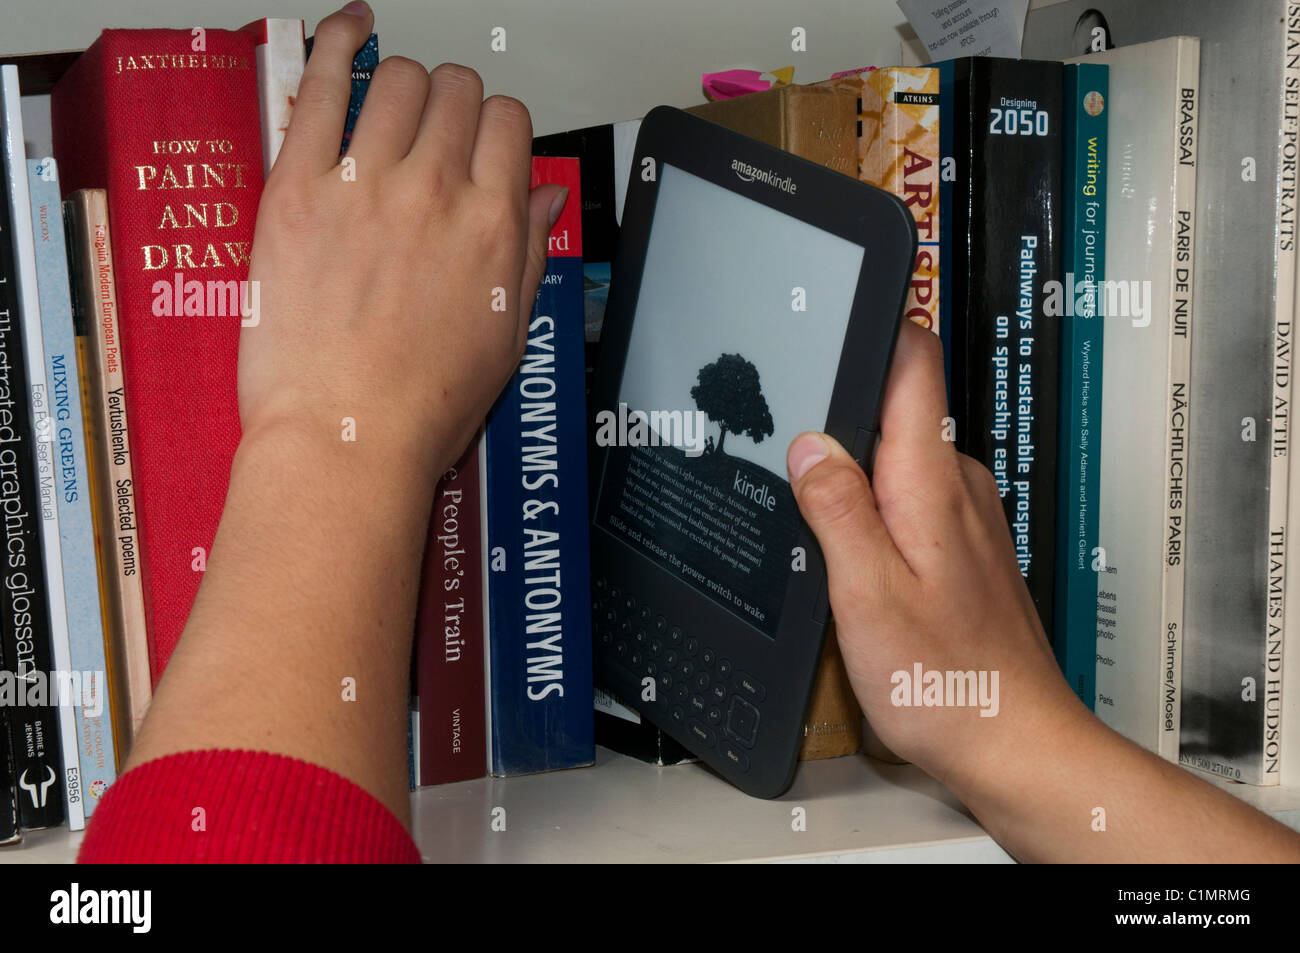 A Kindle 3 amongst traditional print books on a bookshelf - Stock Image